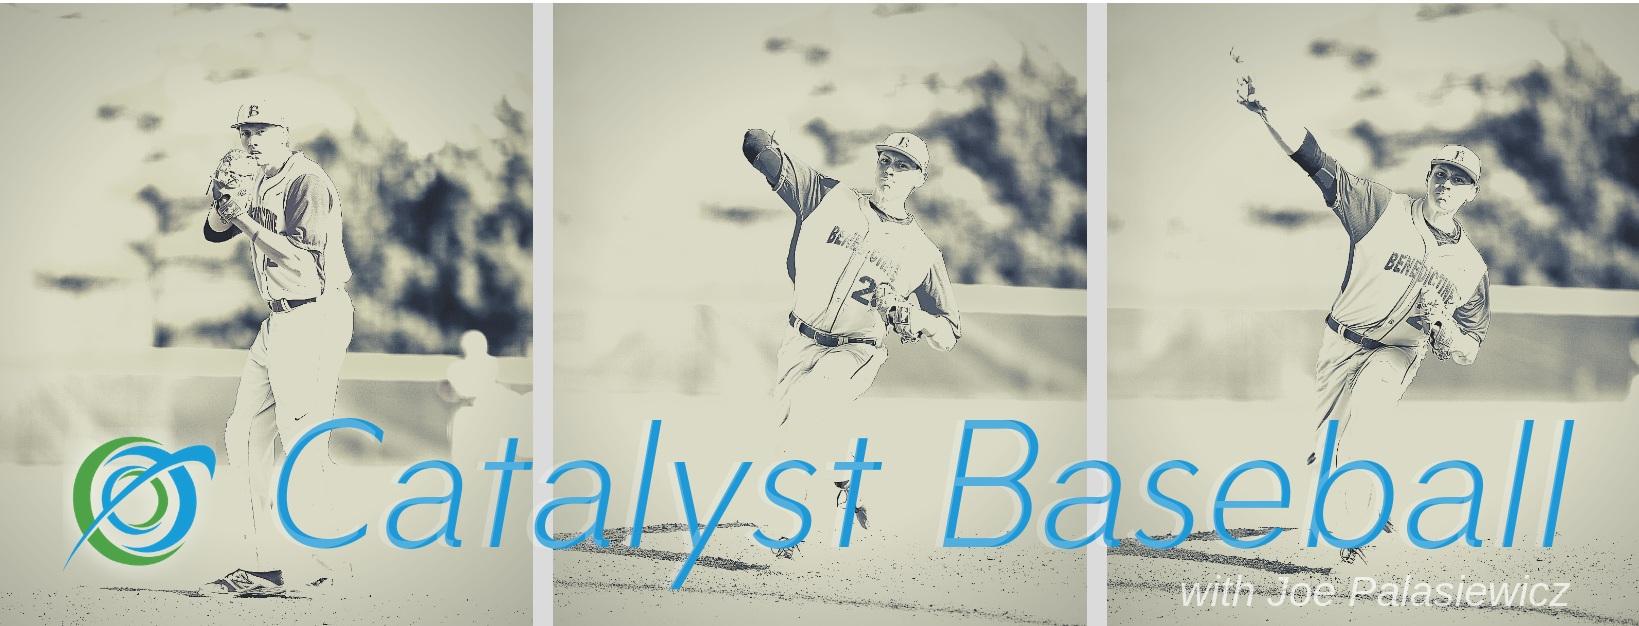 Catalyst+Baseball+with+joe.jpg